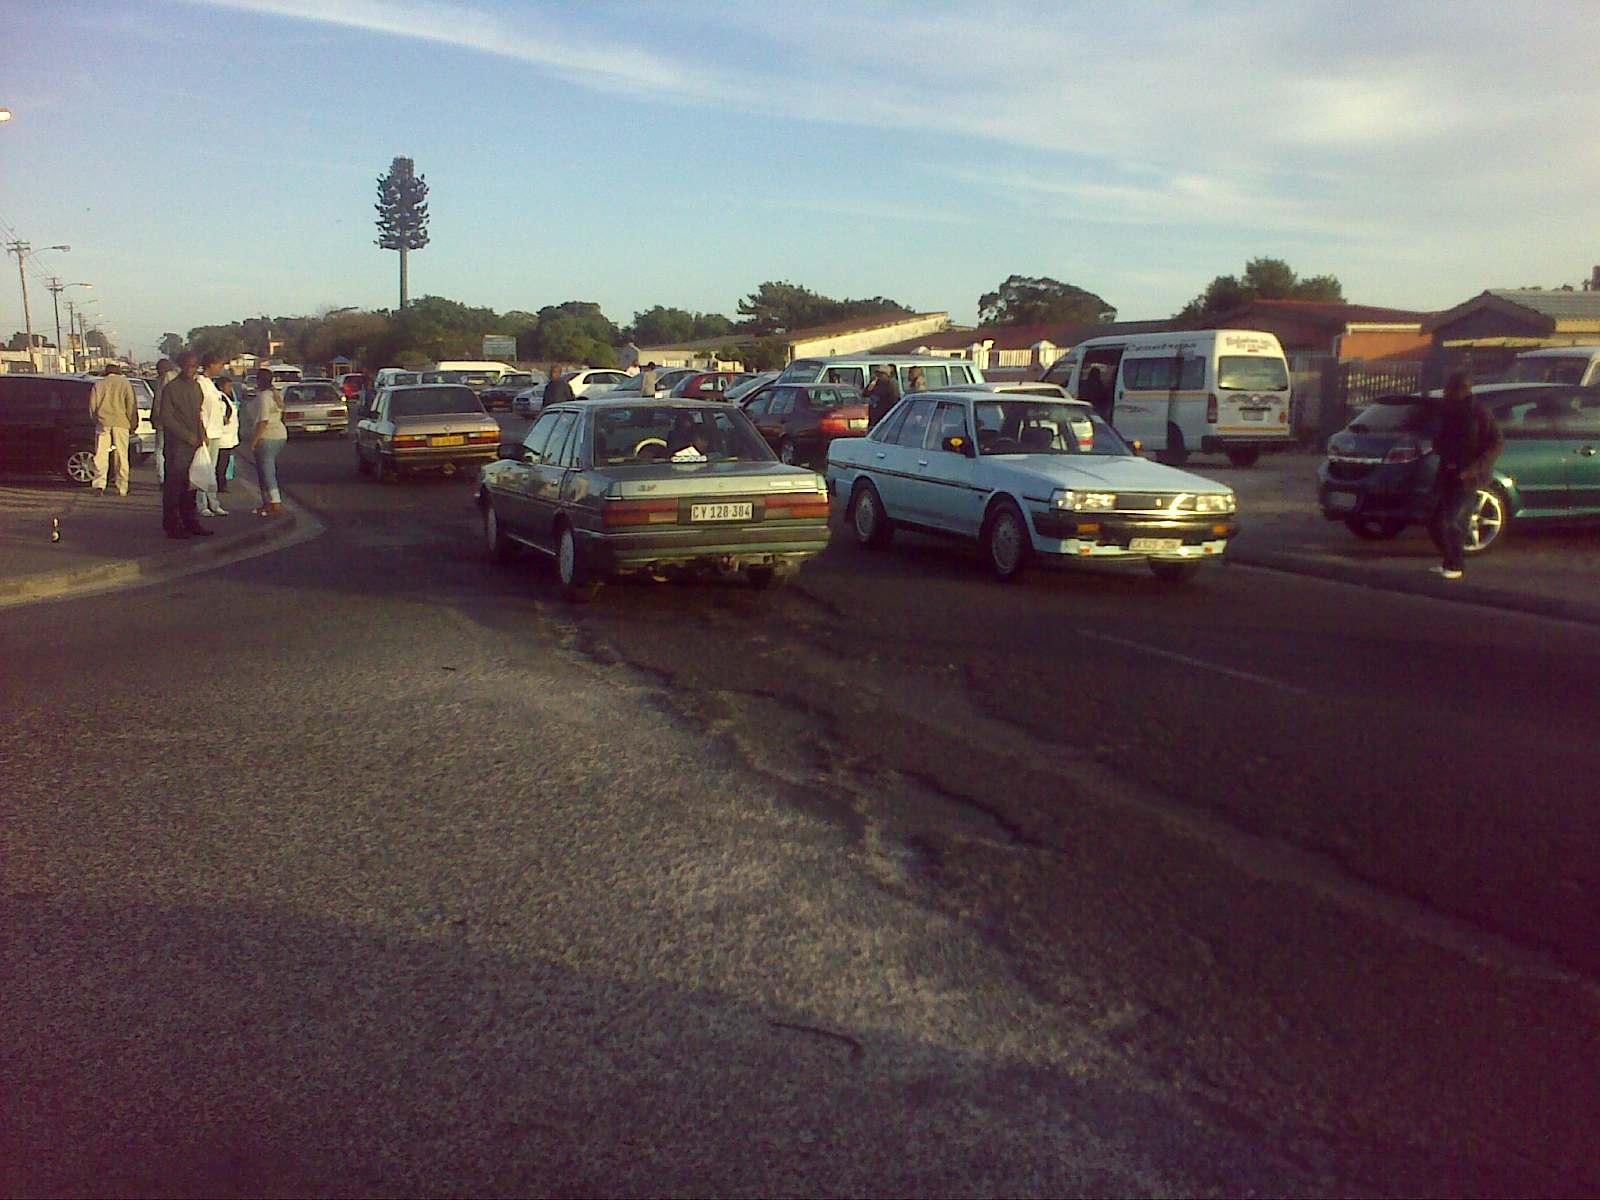 Gugulethu taxis /static/Mzolis/Rida19411.jpg